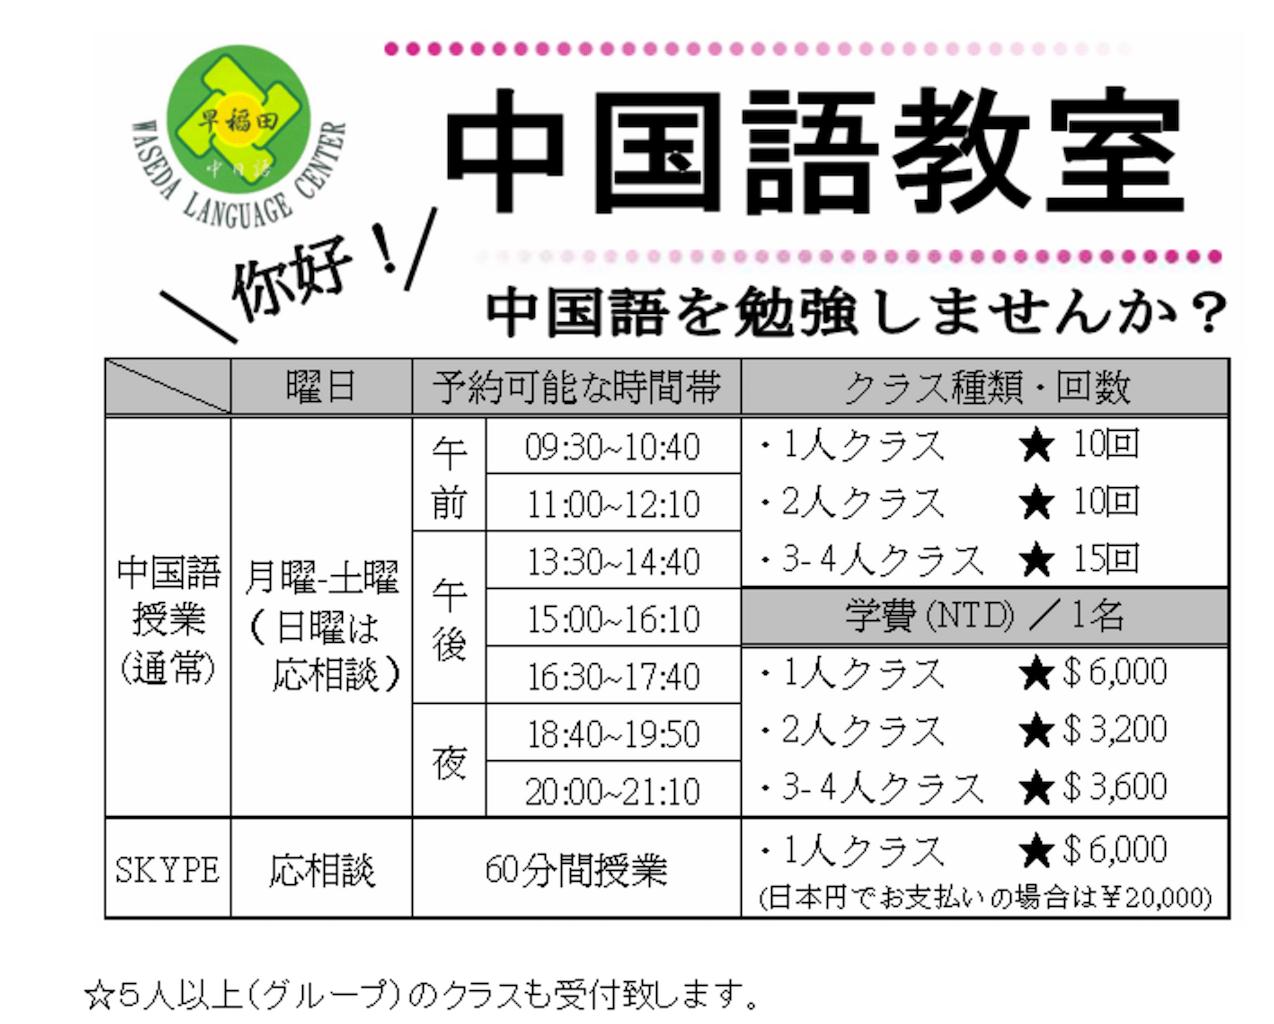 Tainan gogaku waseda schedule